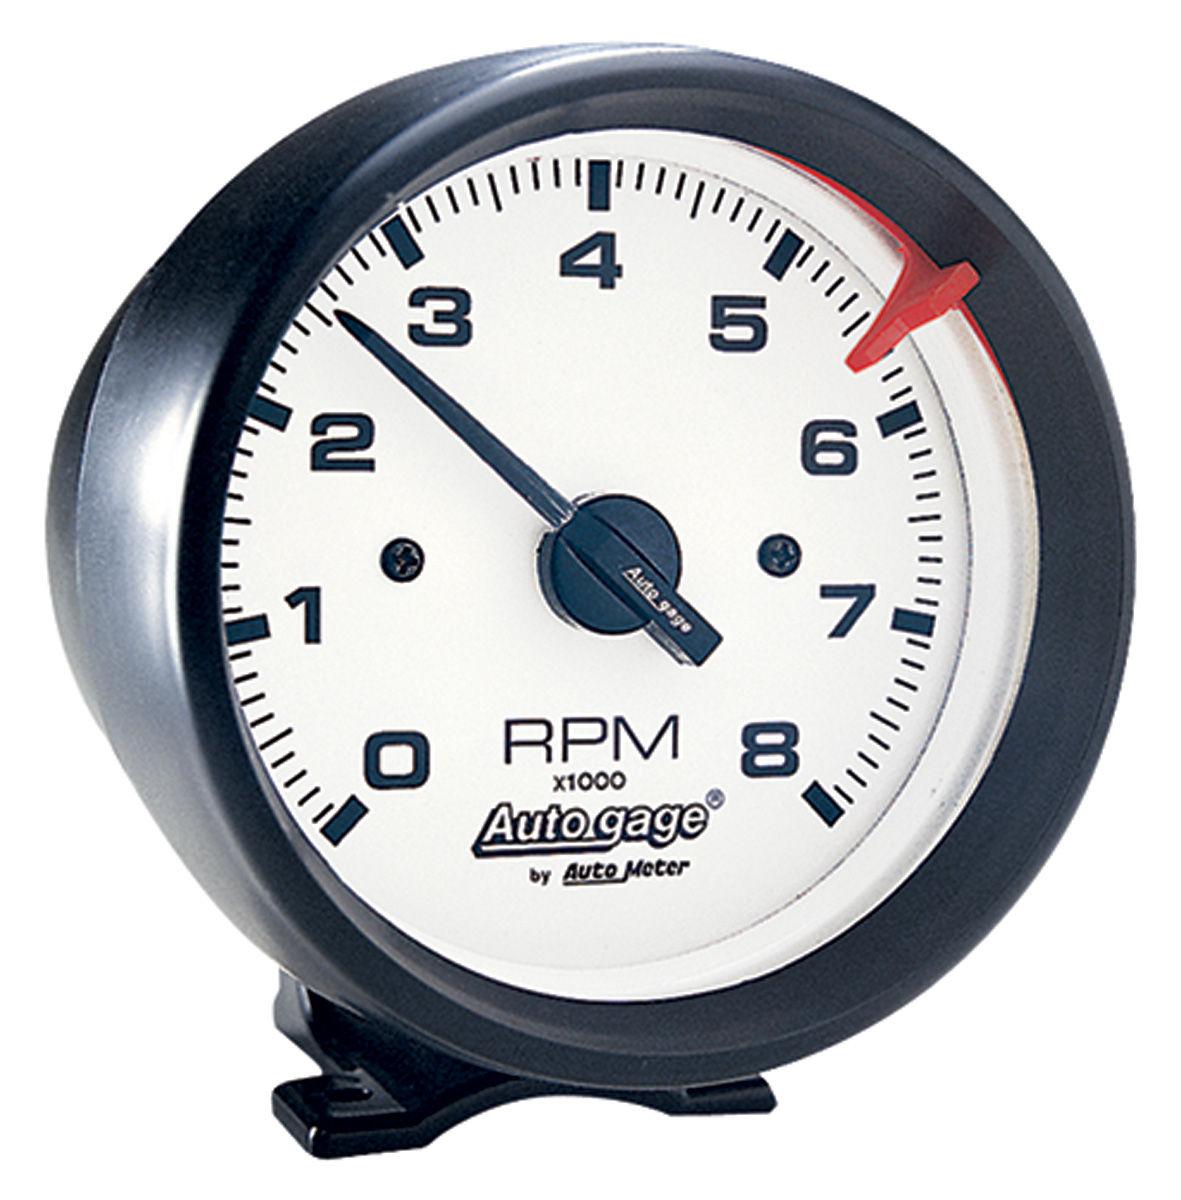 Gauge, Tachometer, Auto Meter, Auto Gage, 3-3/4